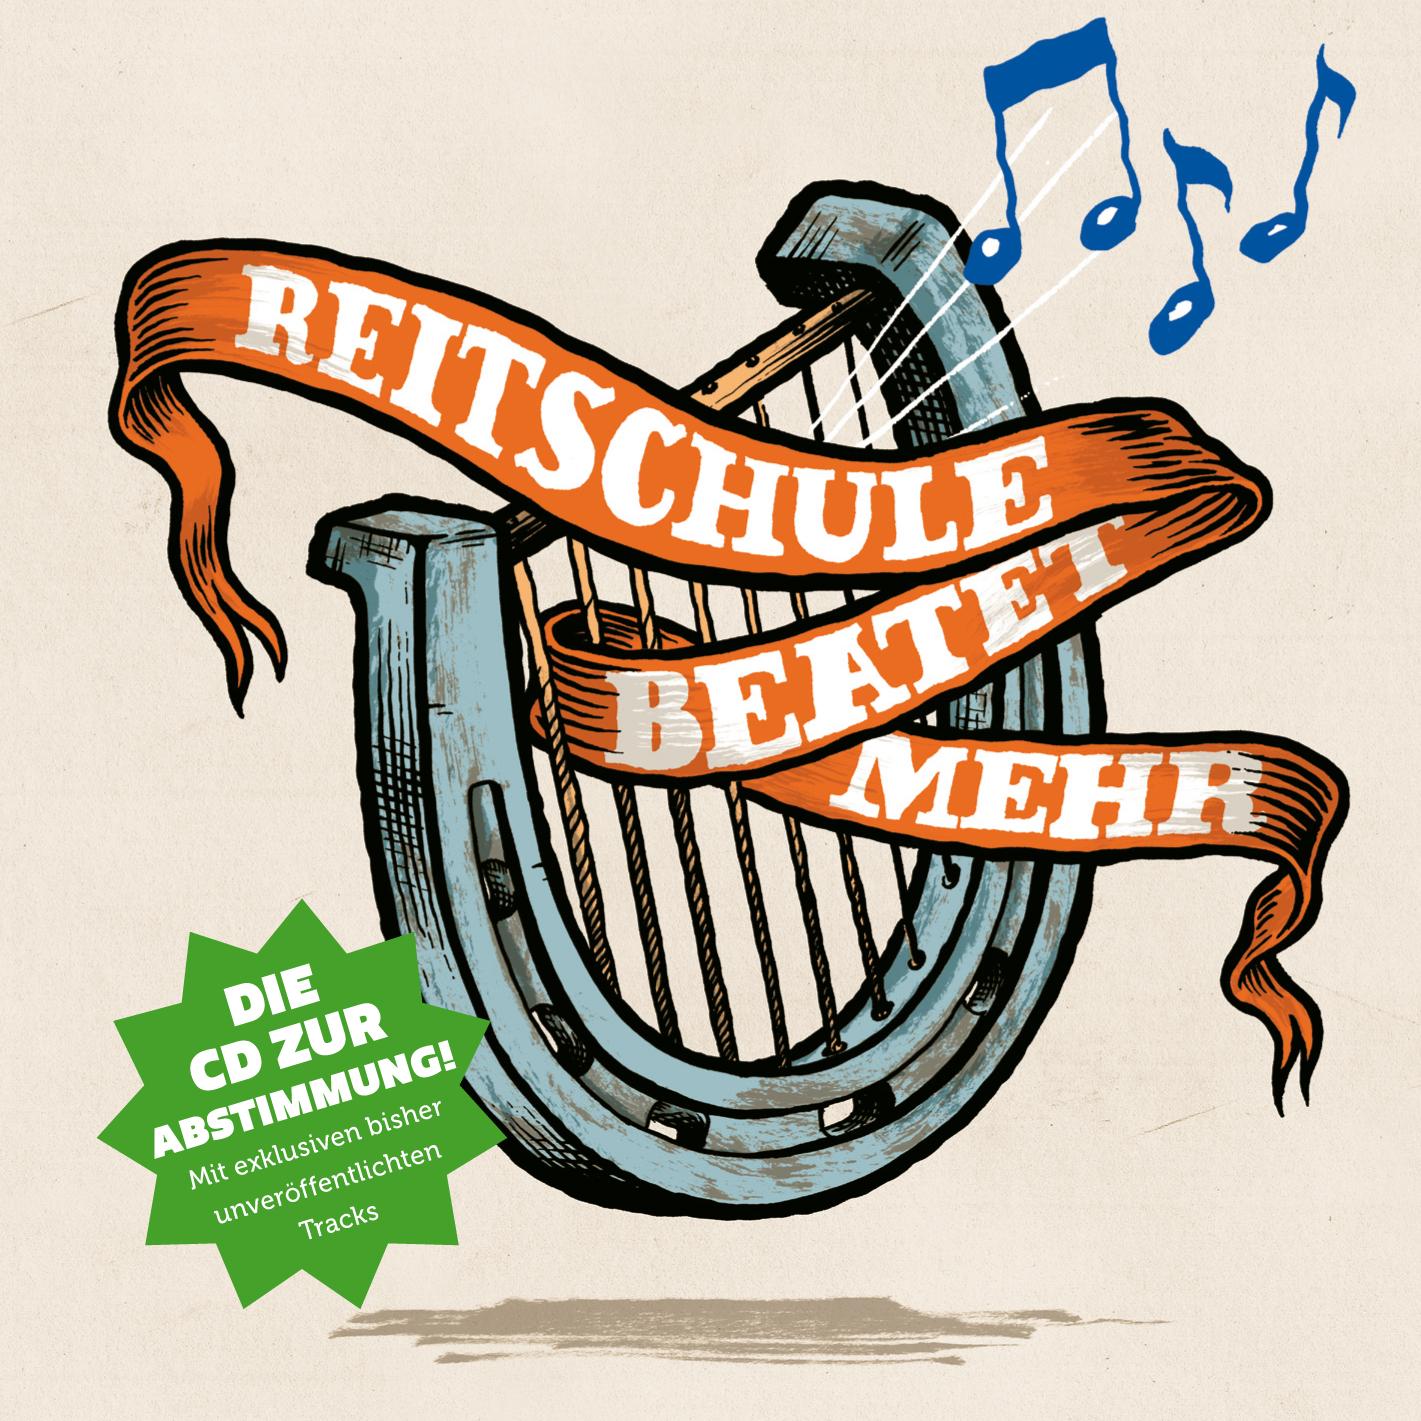 Reitschule_booklet_RZ.indd